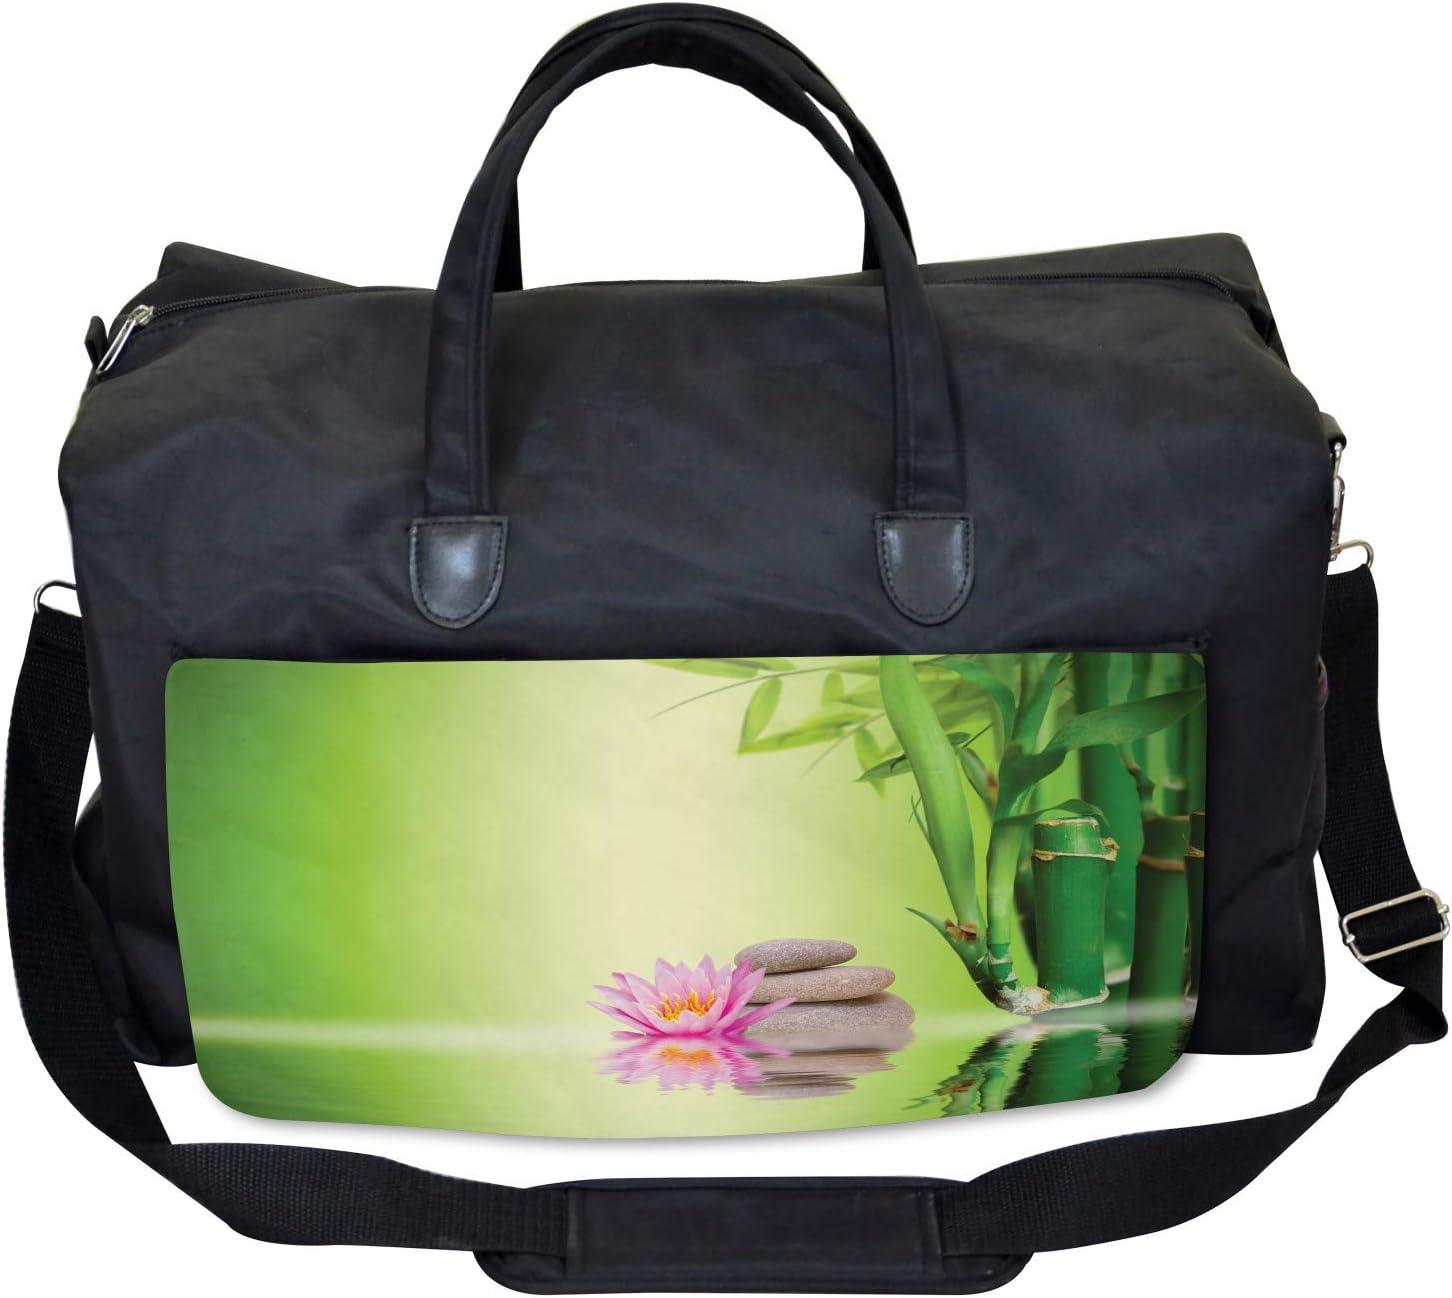 Ambesonne Asian Gym Bag Zen Garden Peaceful Mind Large Weekender Carry-on